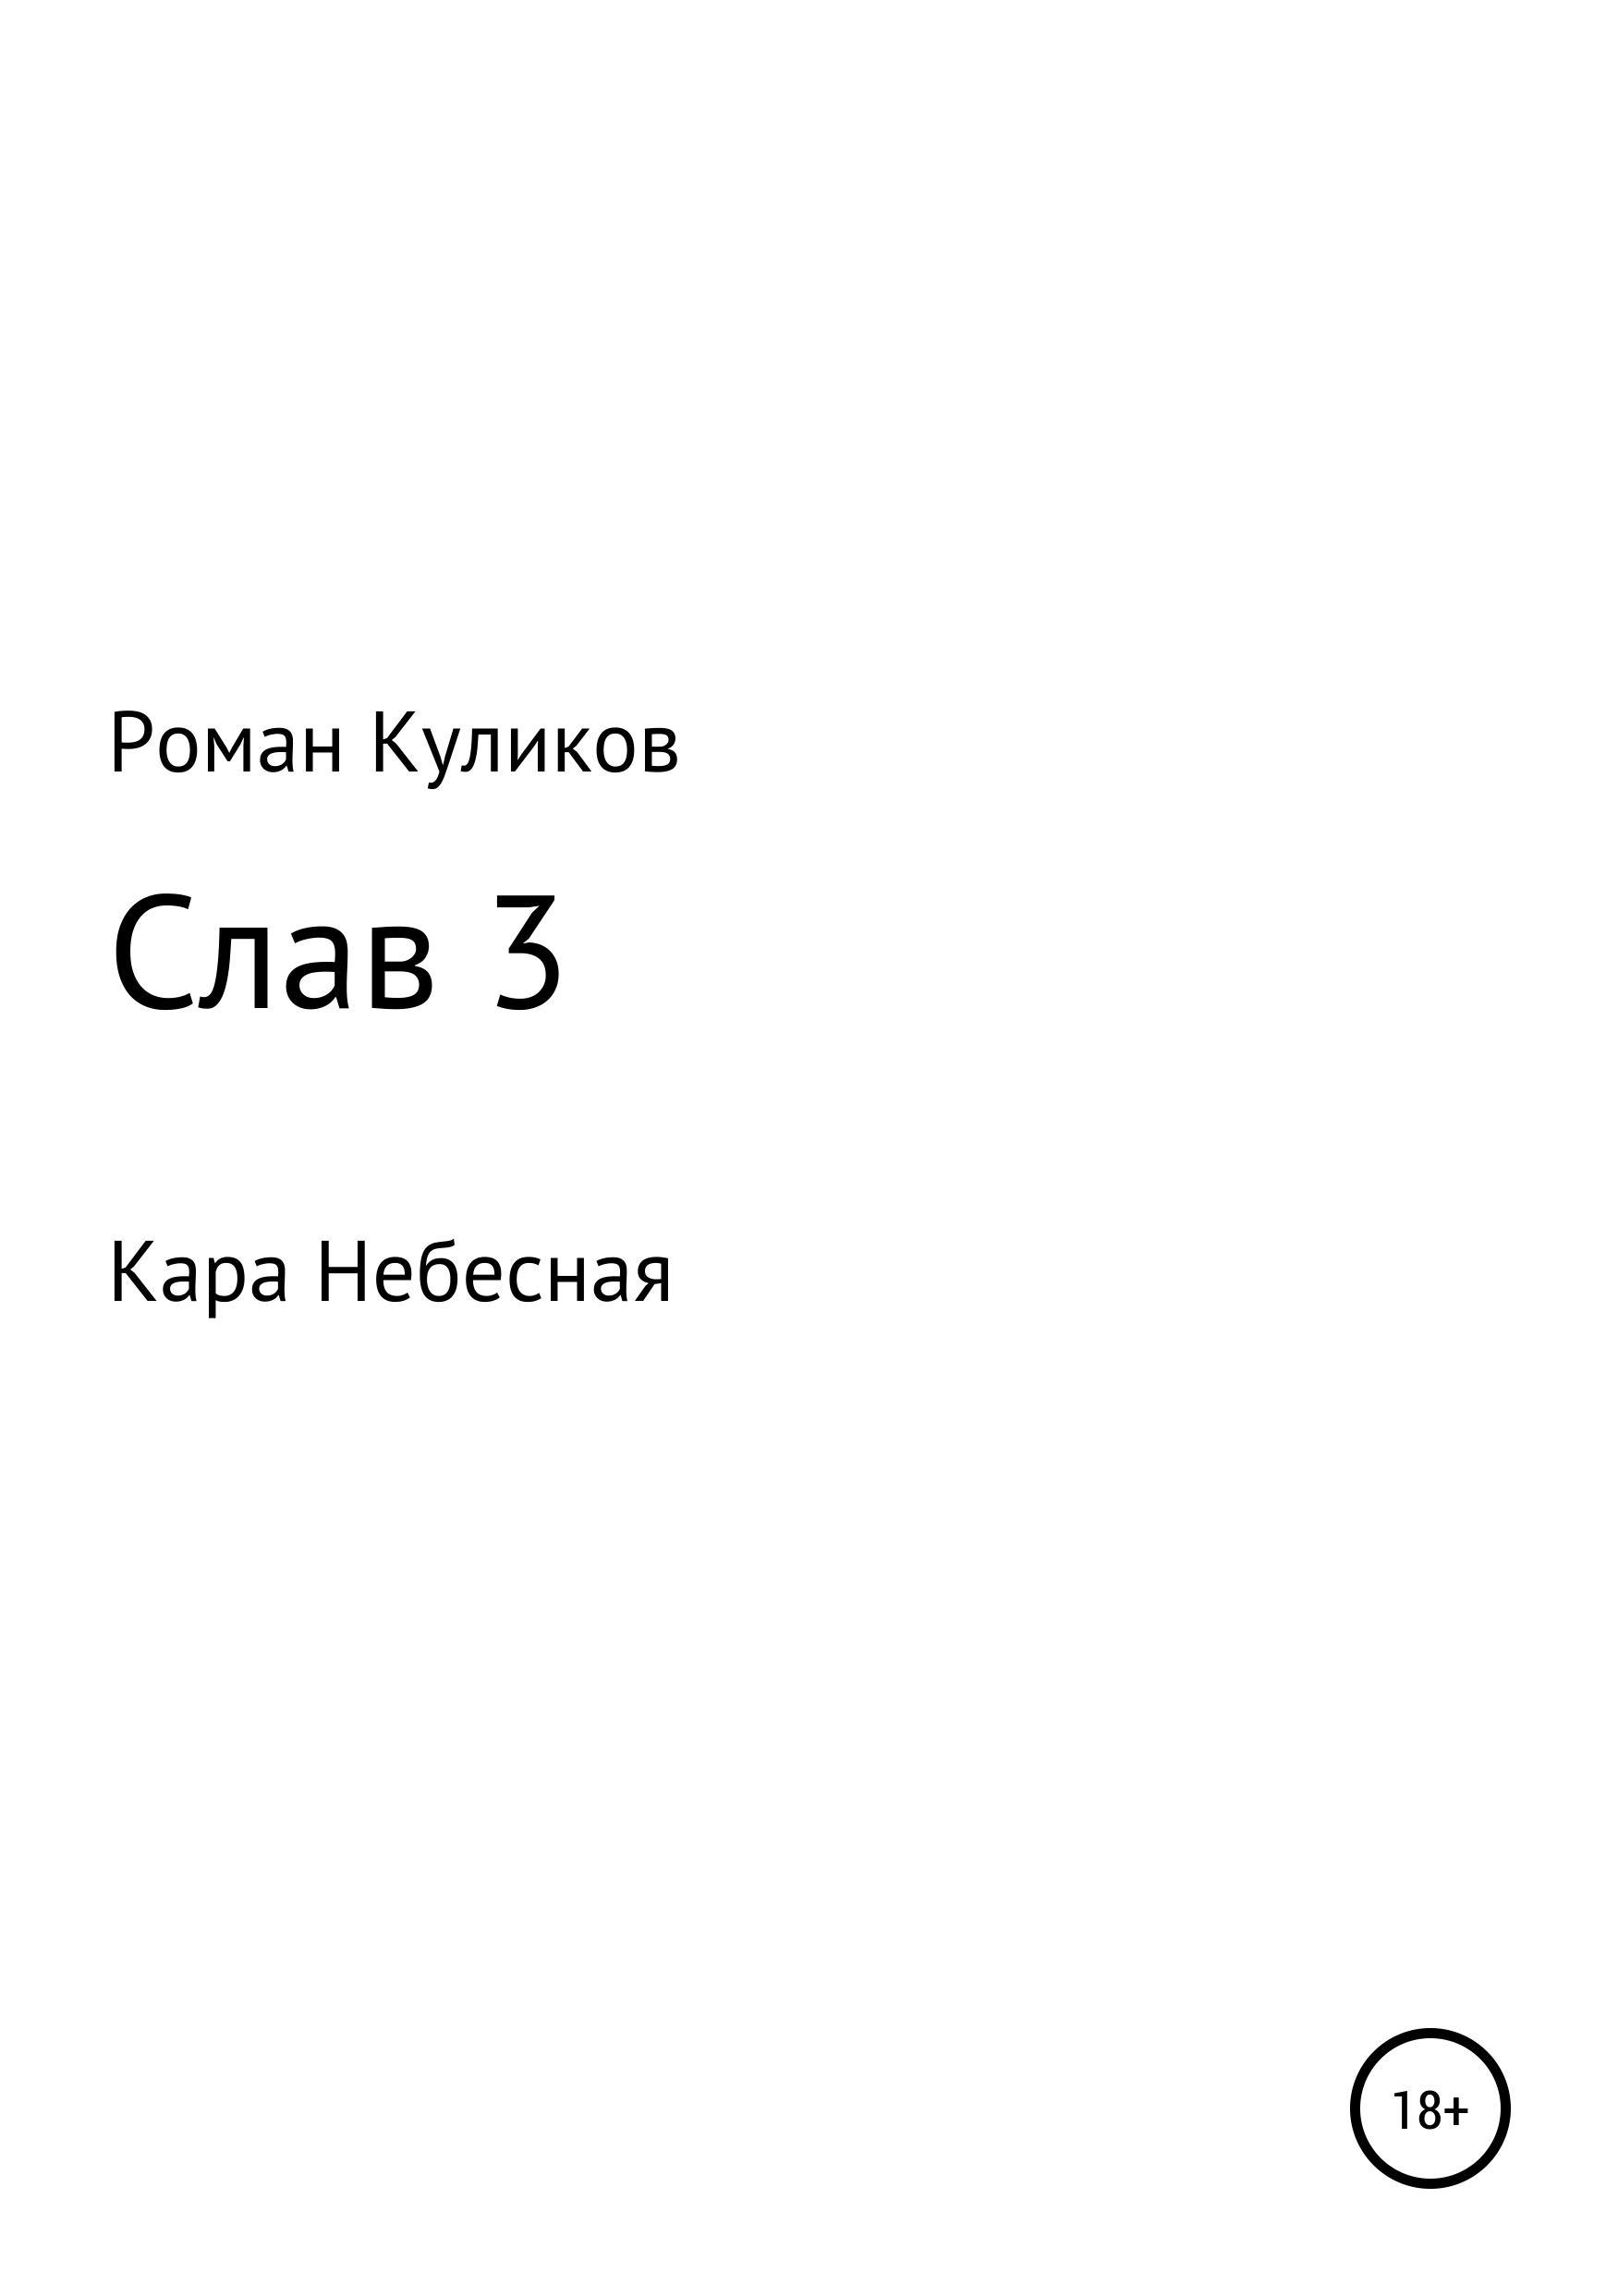 Роман Александрович Куликов Слав 3 Кара Небесная